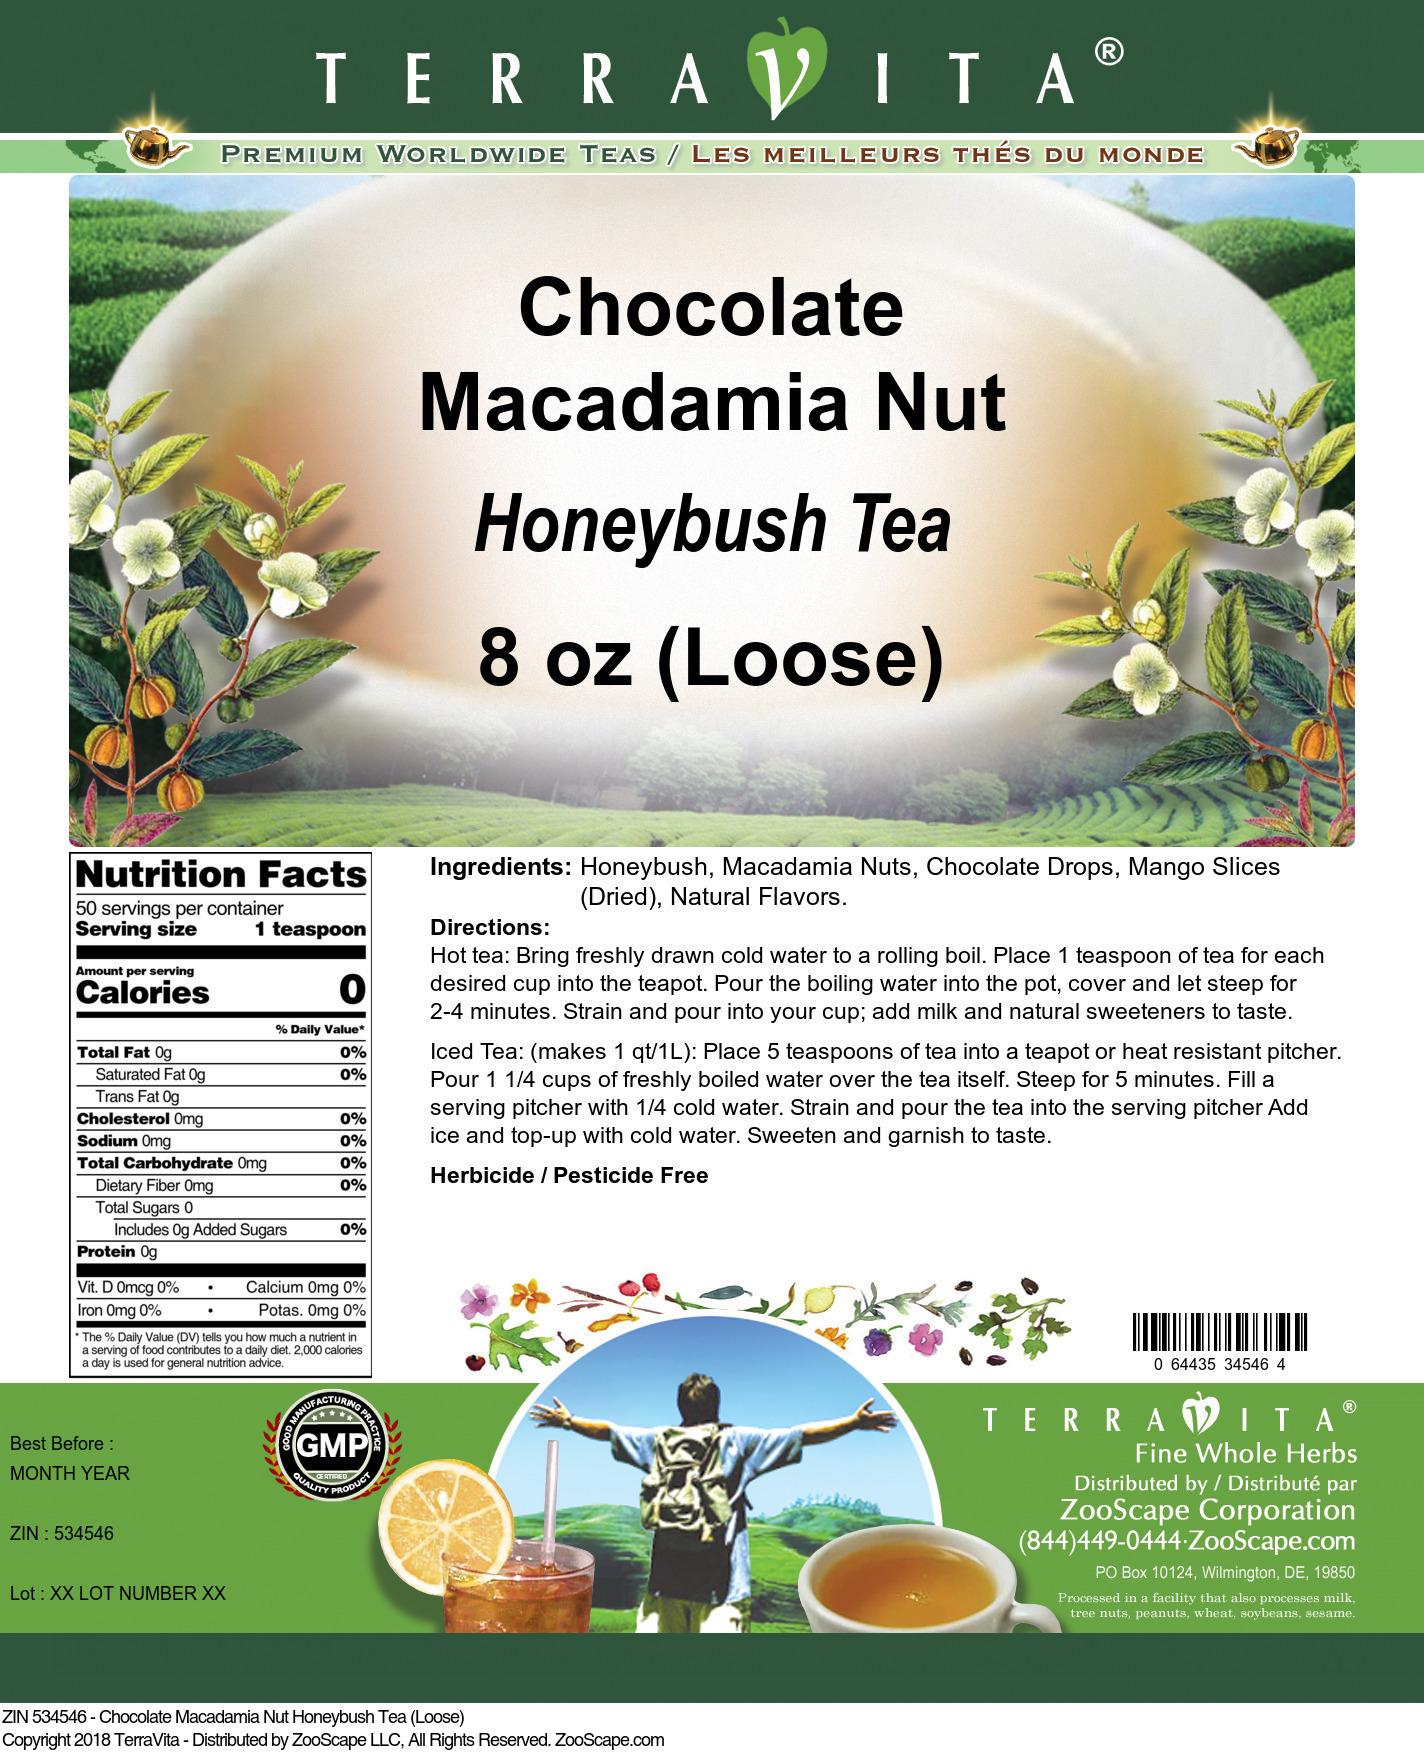 Chocolate Macadamia Nut Honeybush Tea